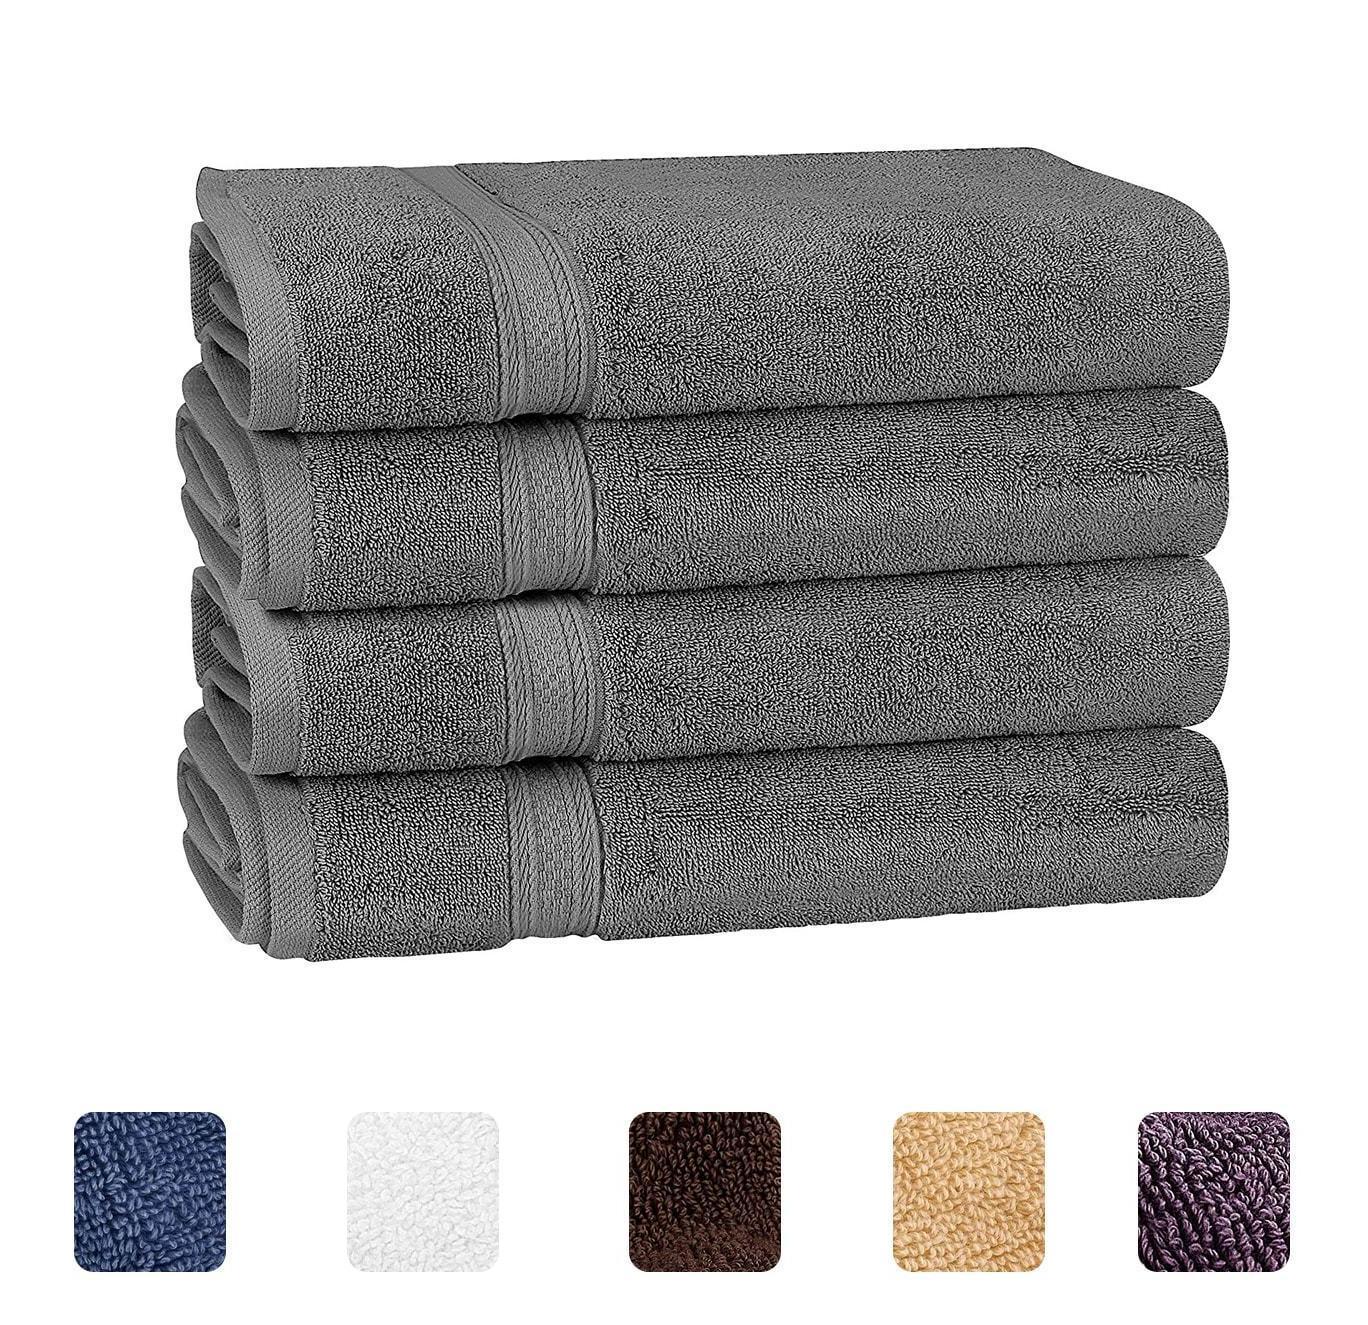 Premium Hand 700 Cotton Pack 16 Inches